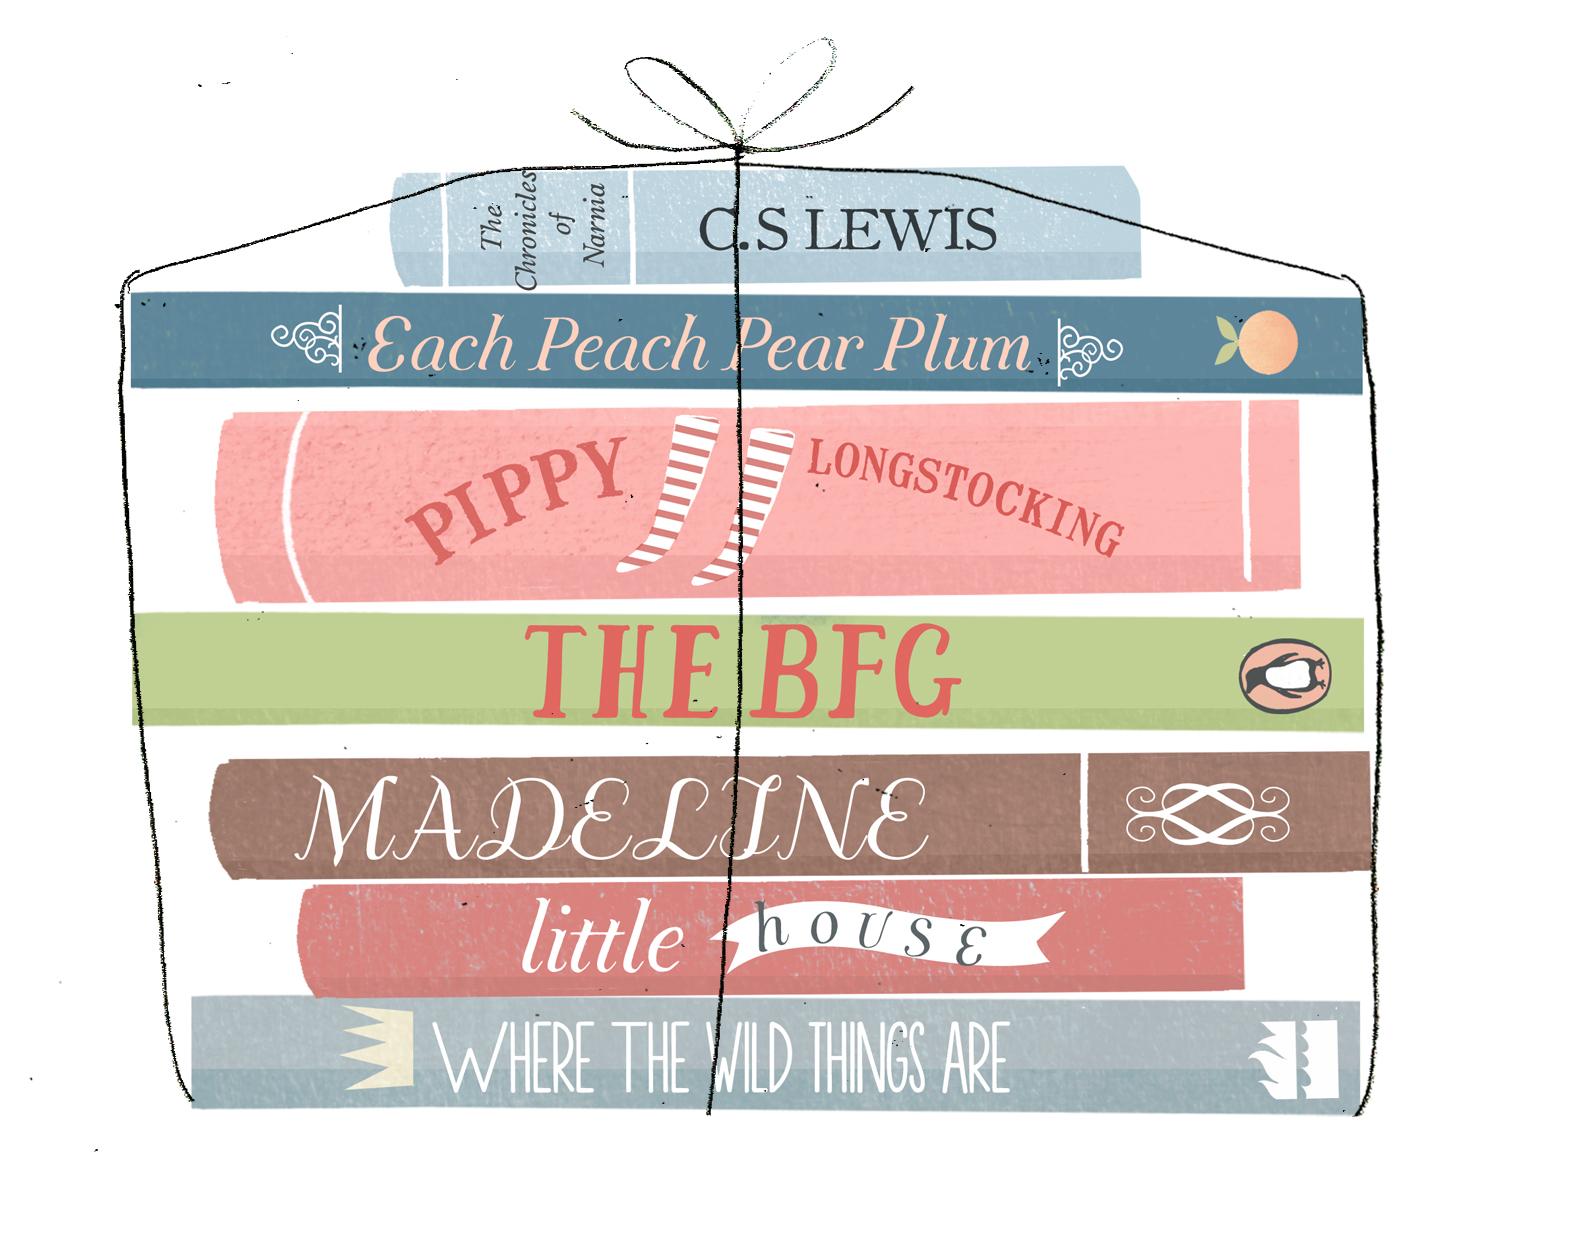 On Our Bookshelf Featuring Julia Child David Sedaris And More